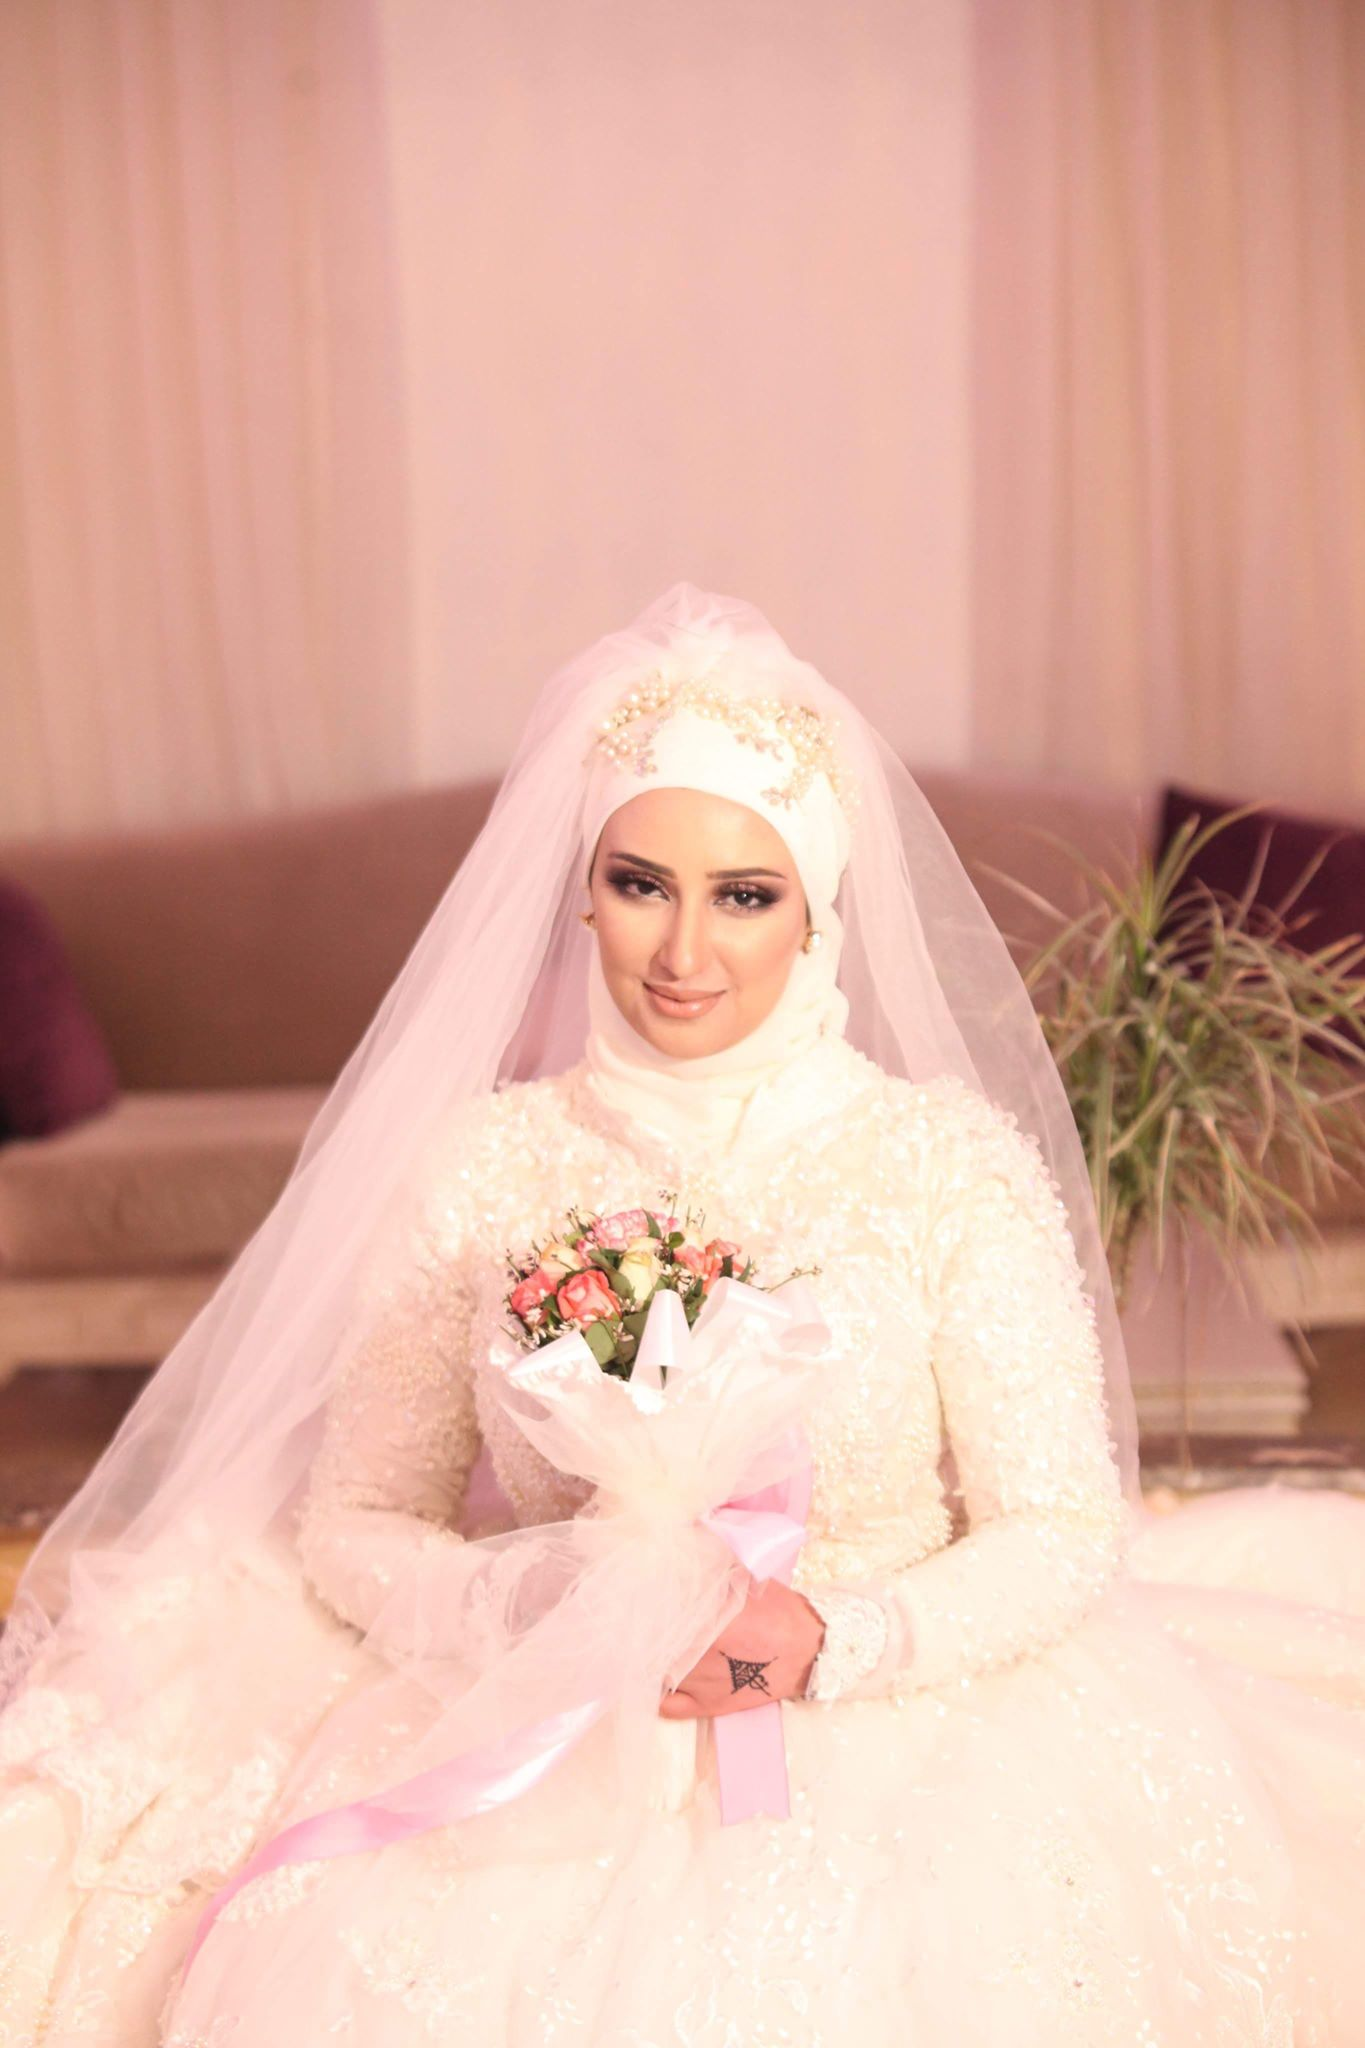 Tesnim_M10_plus_belles_mariées_tunisiennes2019